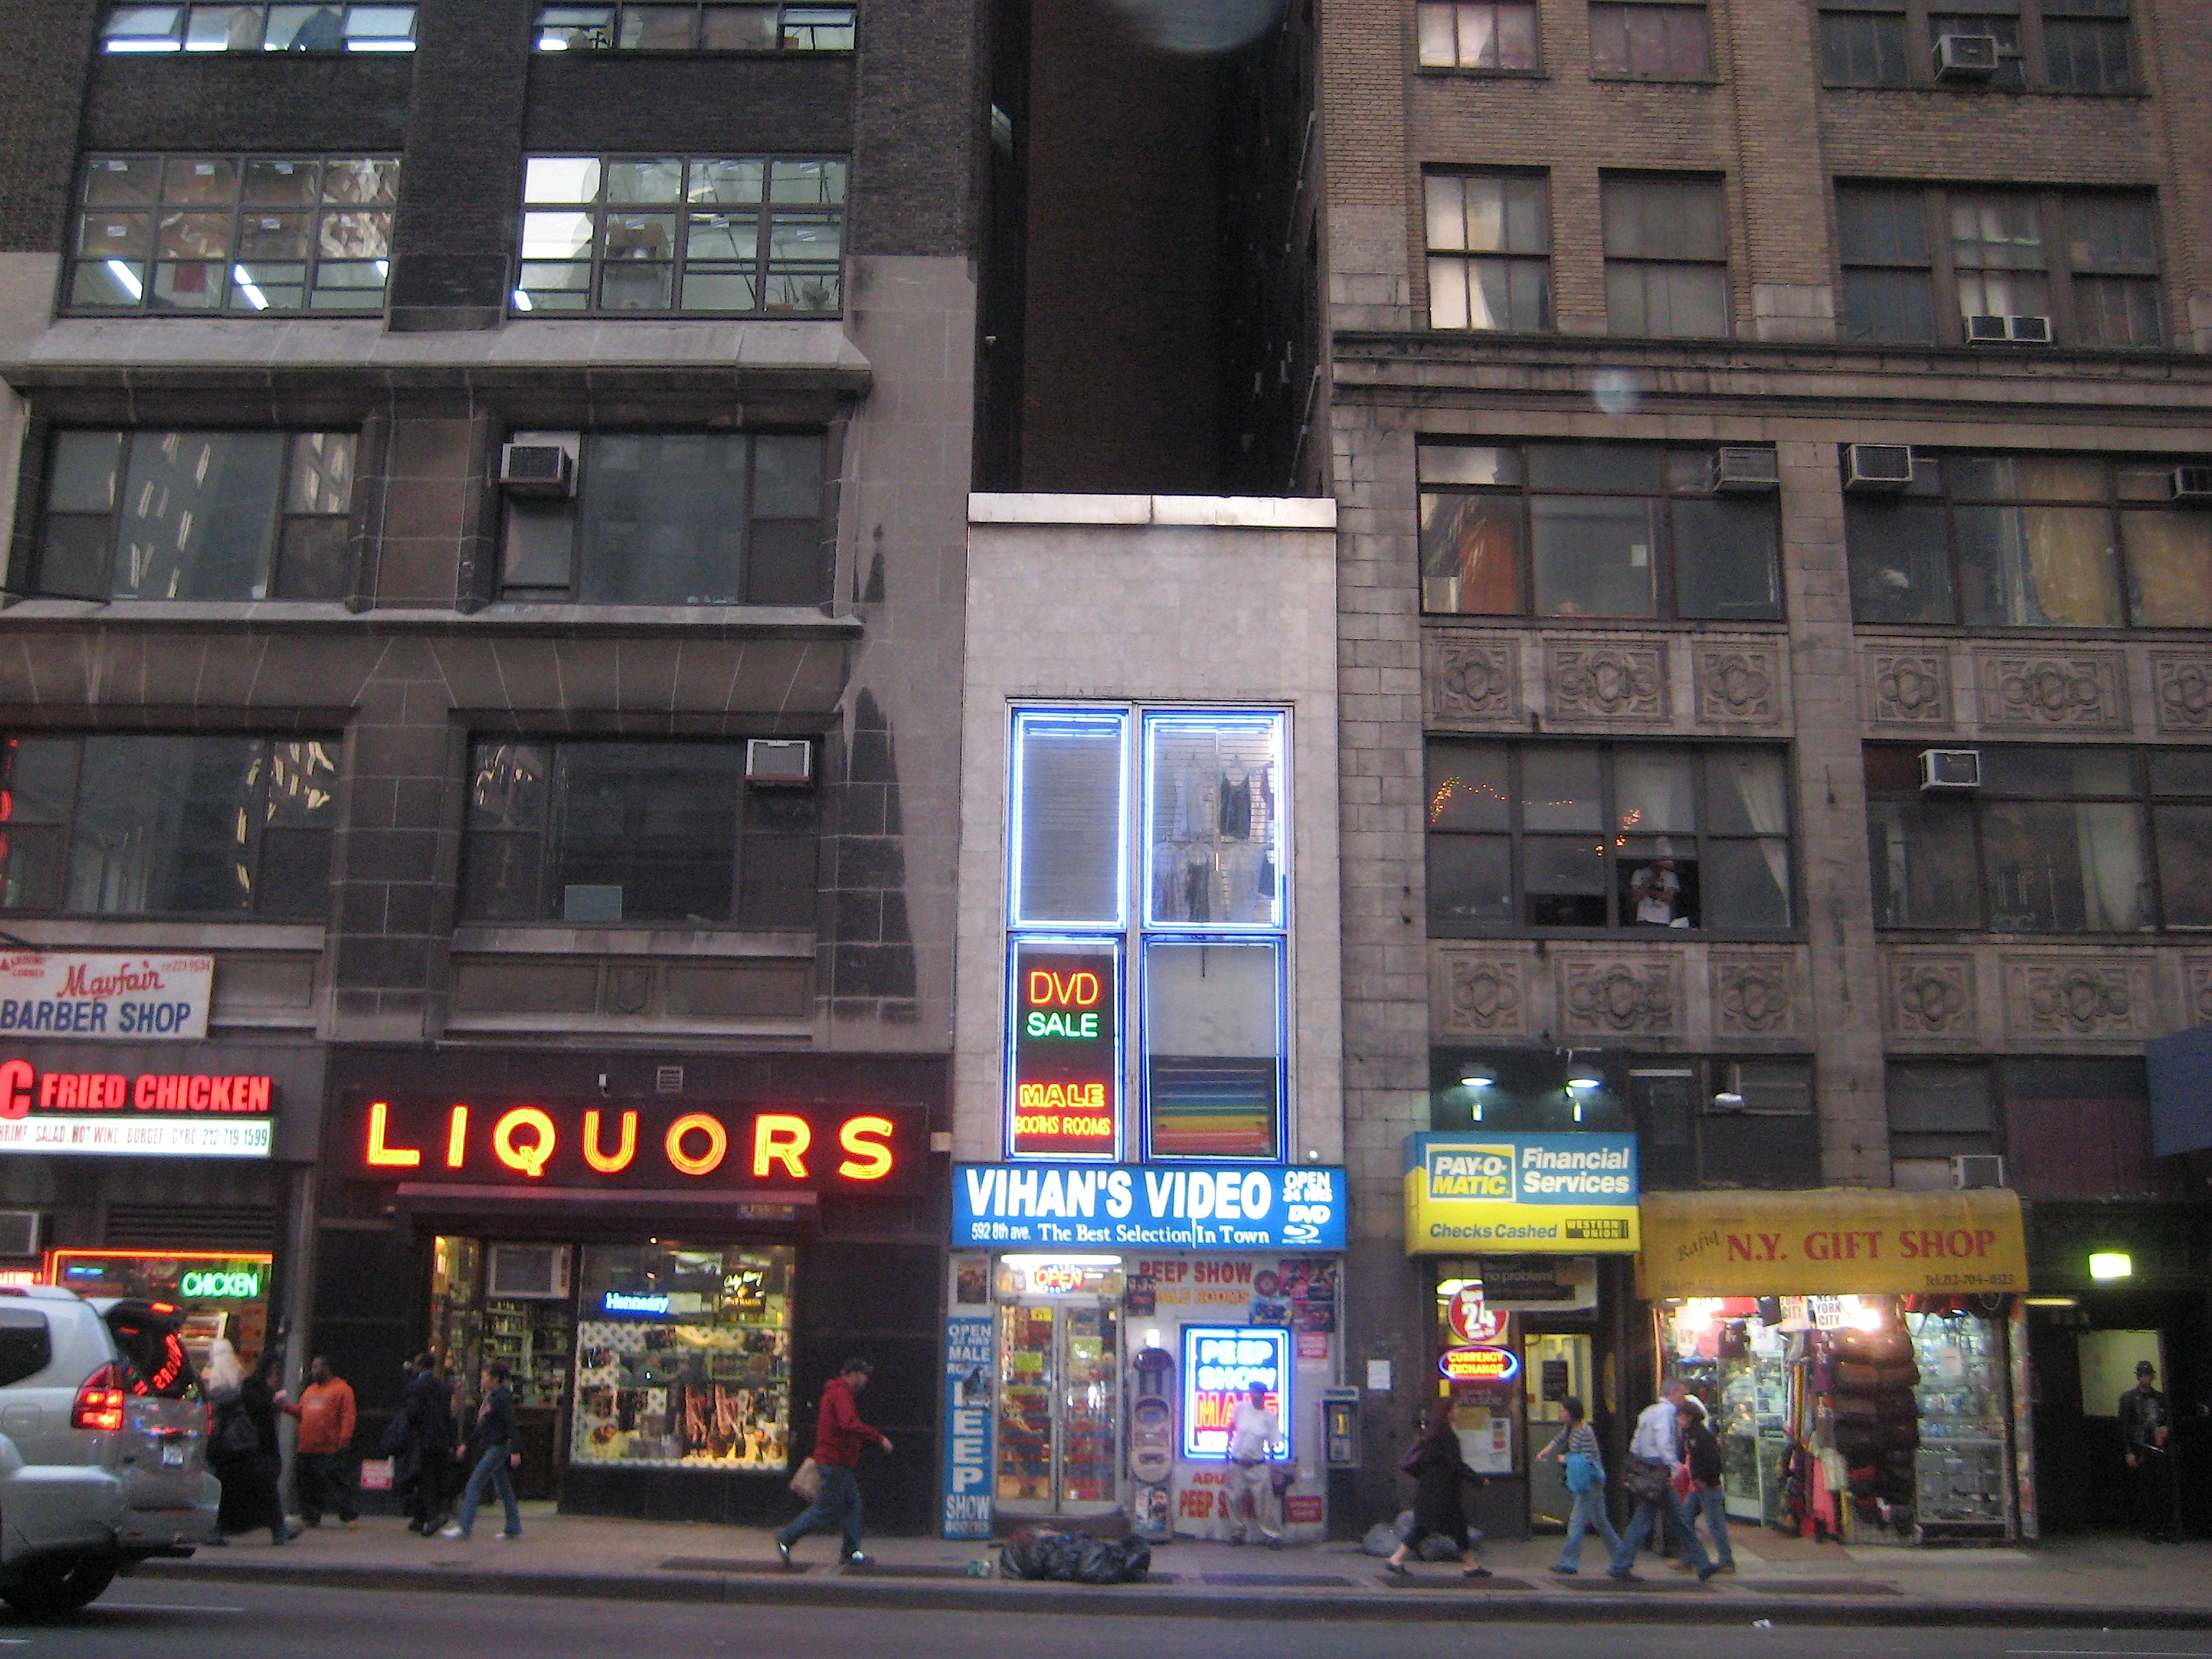 Sixth street avenue porno